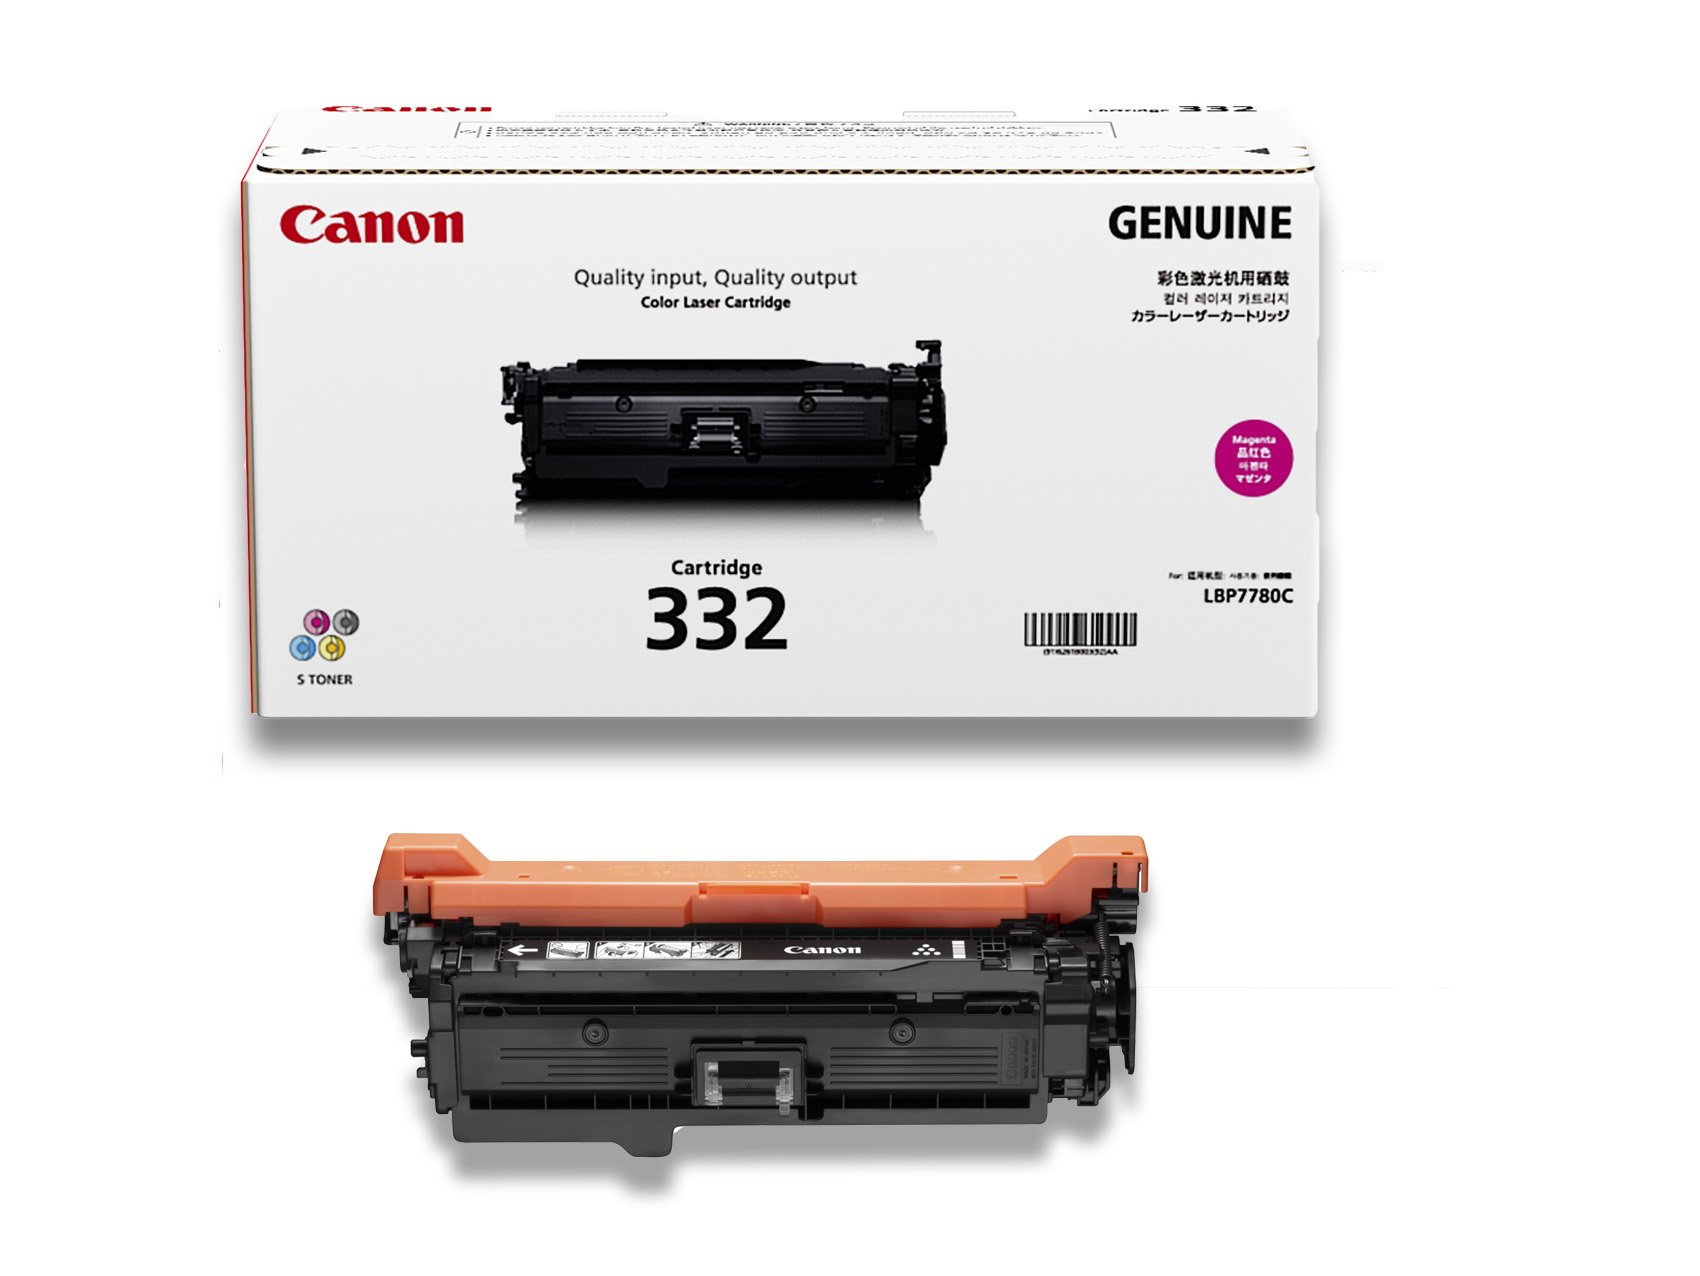 Canon Genuine Toner, Cartridge 332 Magenta (6261B012), 1 Pack, for Canon Color imageCLASS LBP7780Cdn Laser Printer